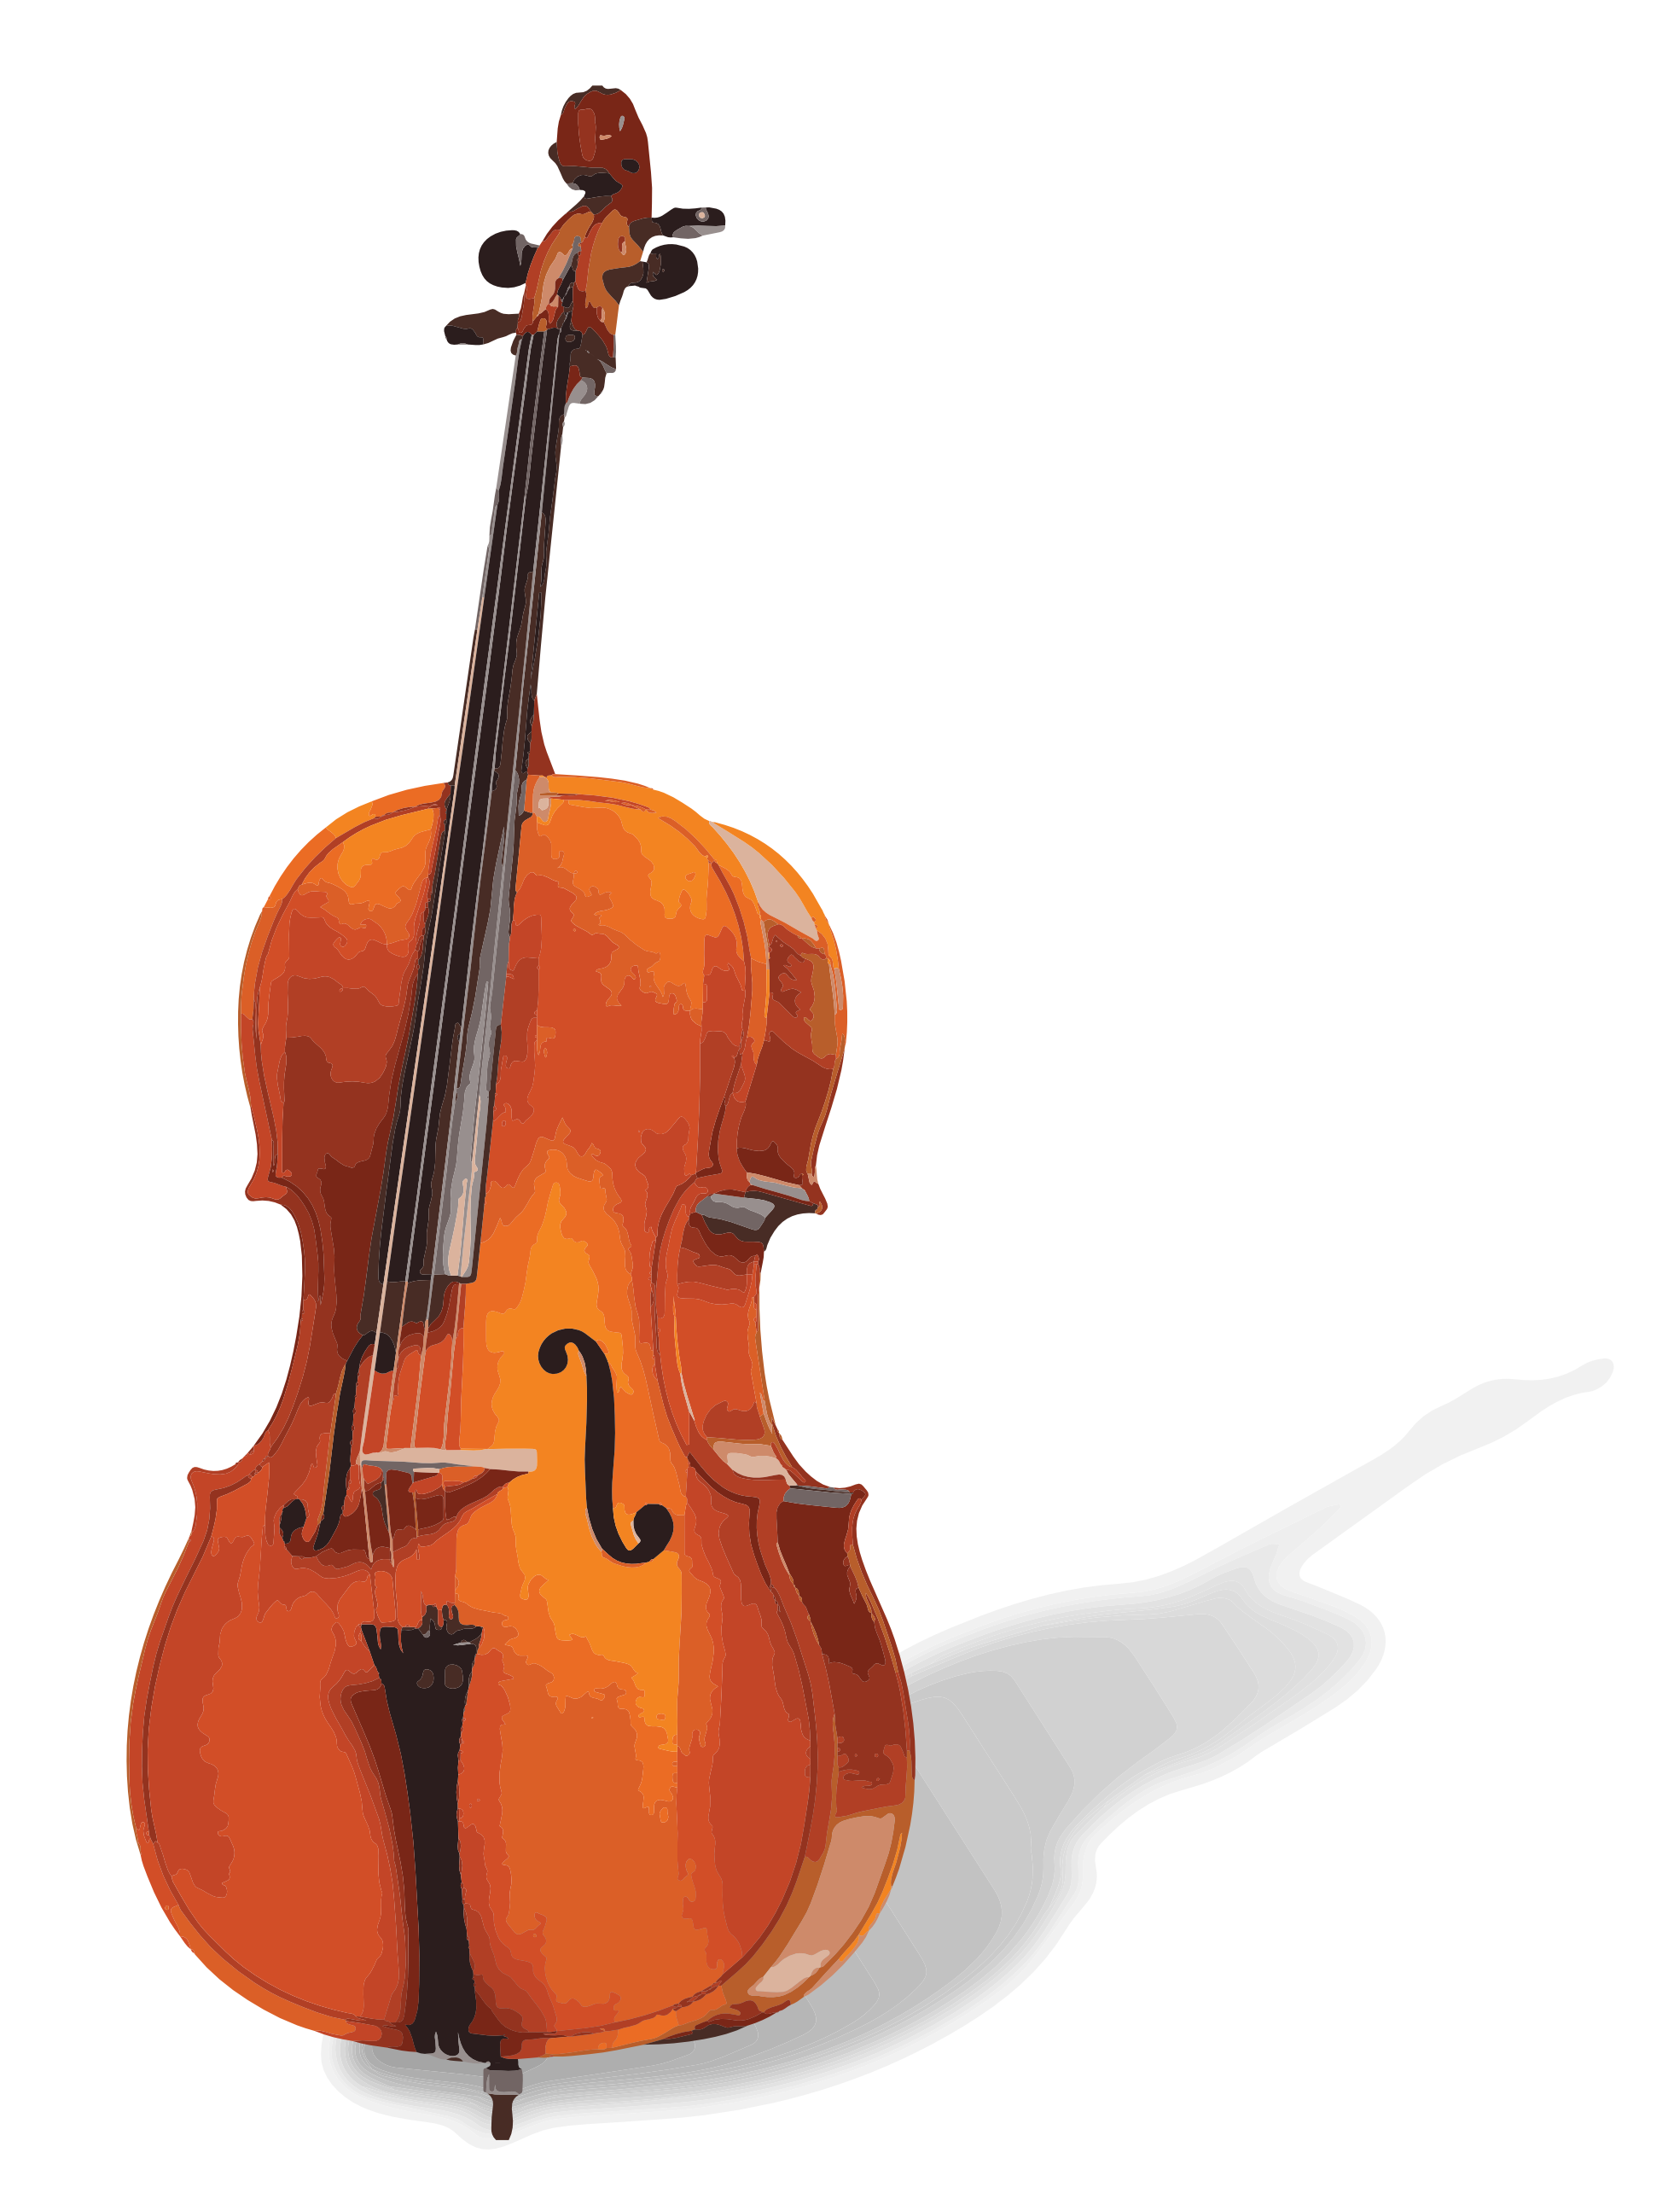 1969x2584 15 Cello Vector Svg For Free Download On Mbtskoudsalg